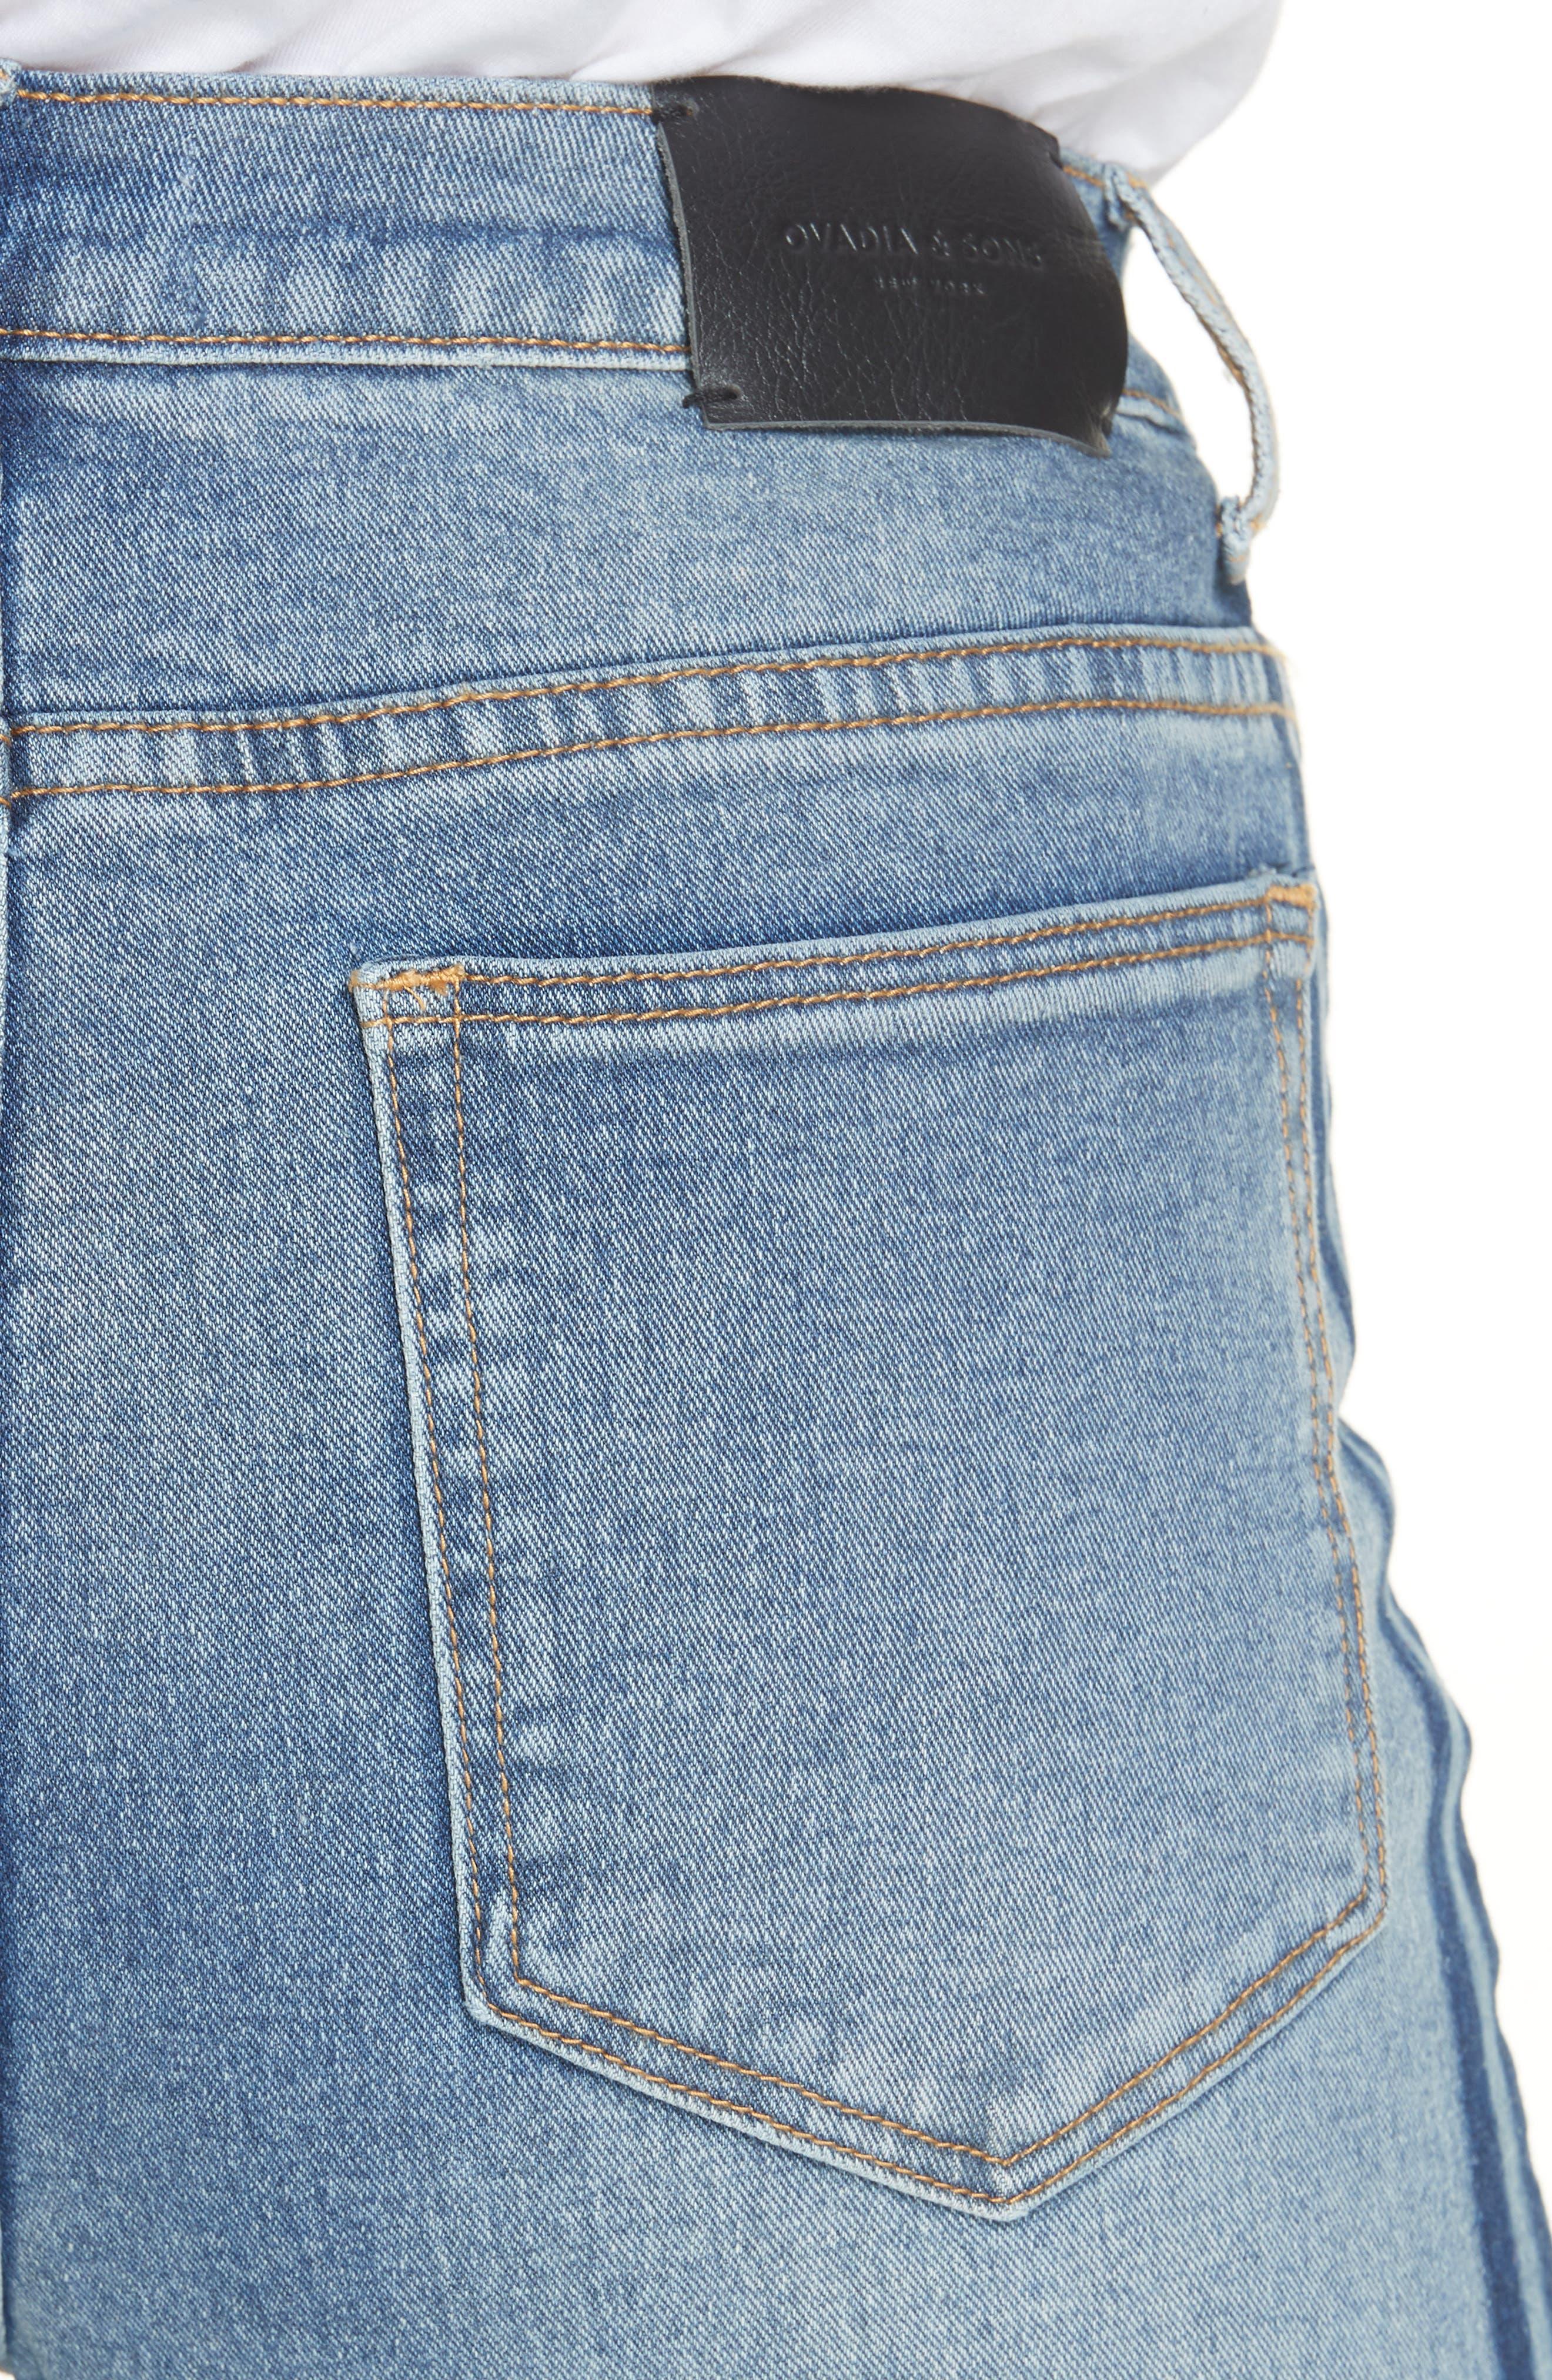 OVADIA & SONS,                             OS-1 Slim Fit Jeans,                             Alternate thumbnail 5, color,                             INDIGO